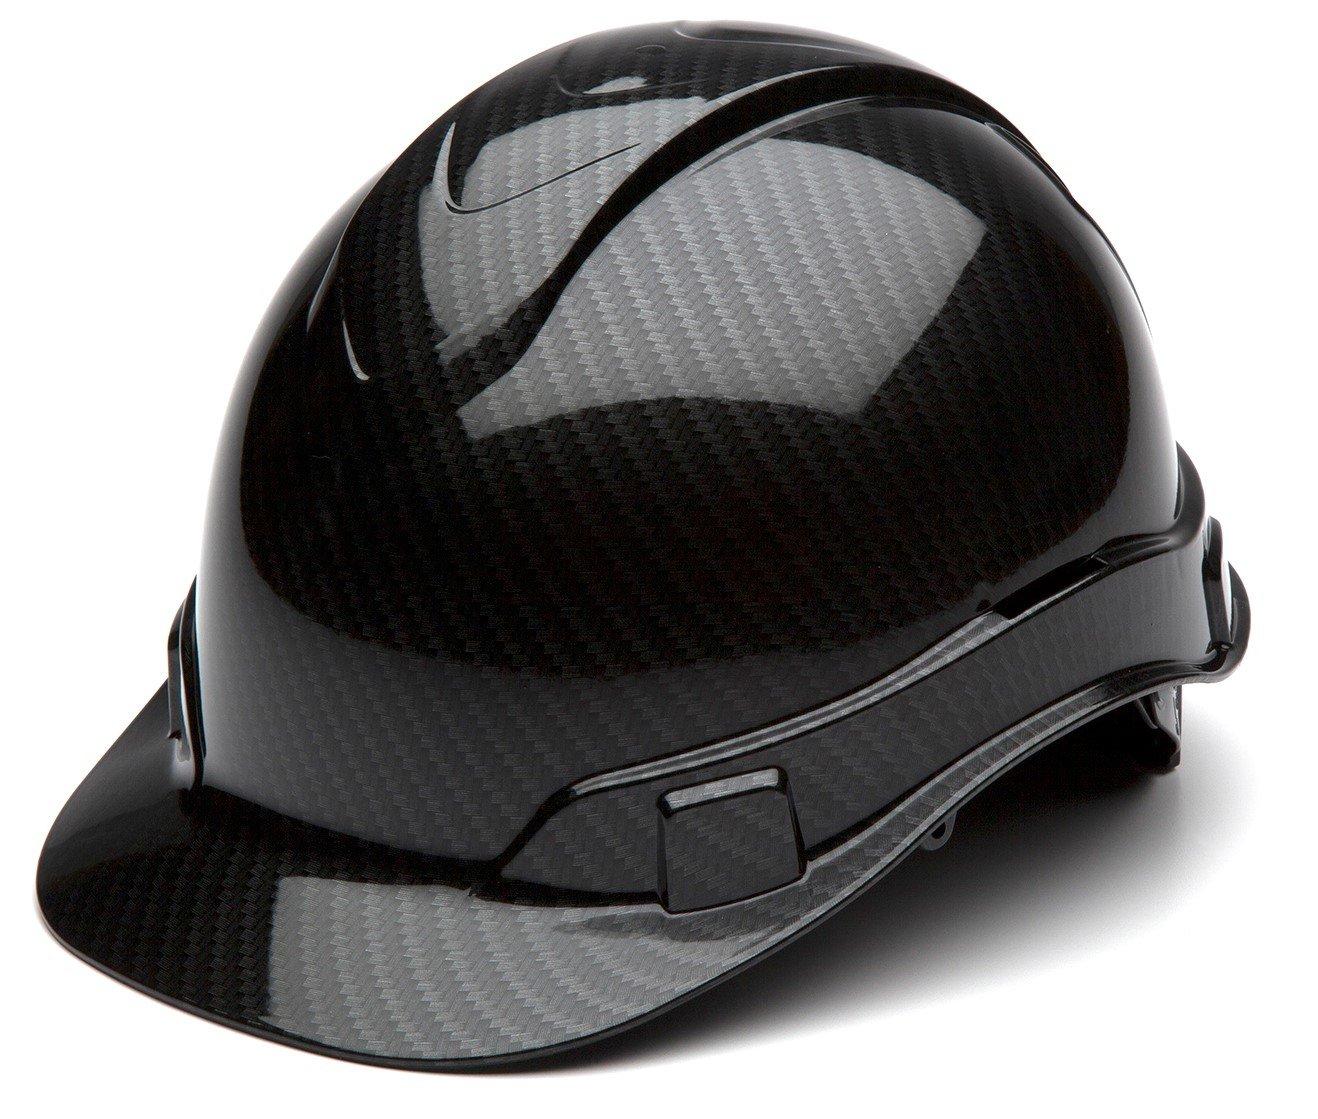 Pyramex Ridgeline Cap Style Hard Hat, 4 Point Ratchet Suspension, Shiny Black Graphite Pattern